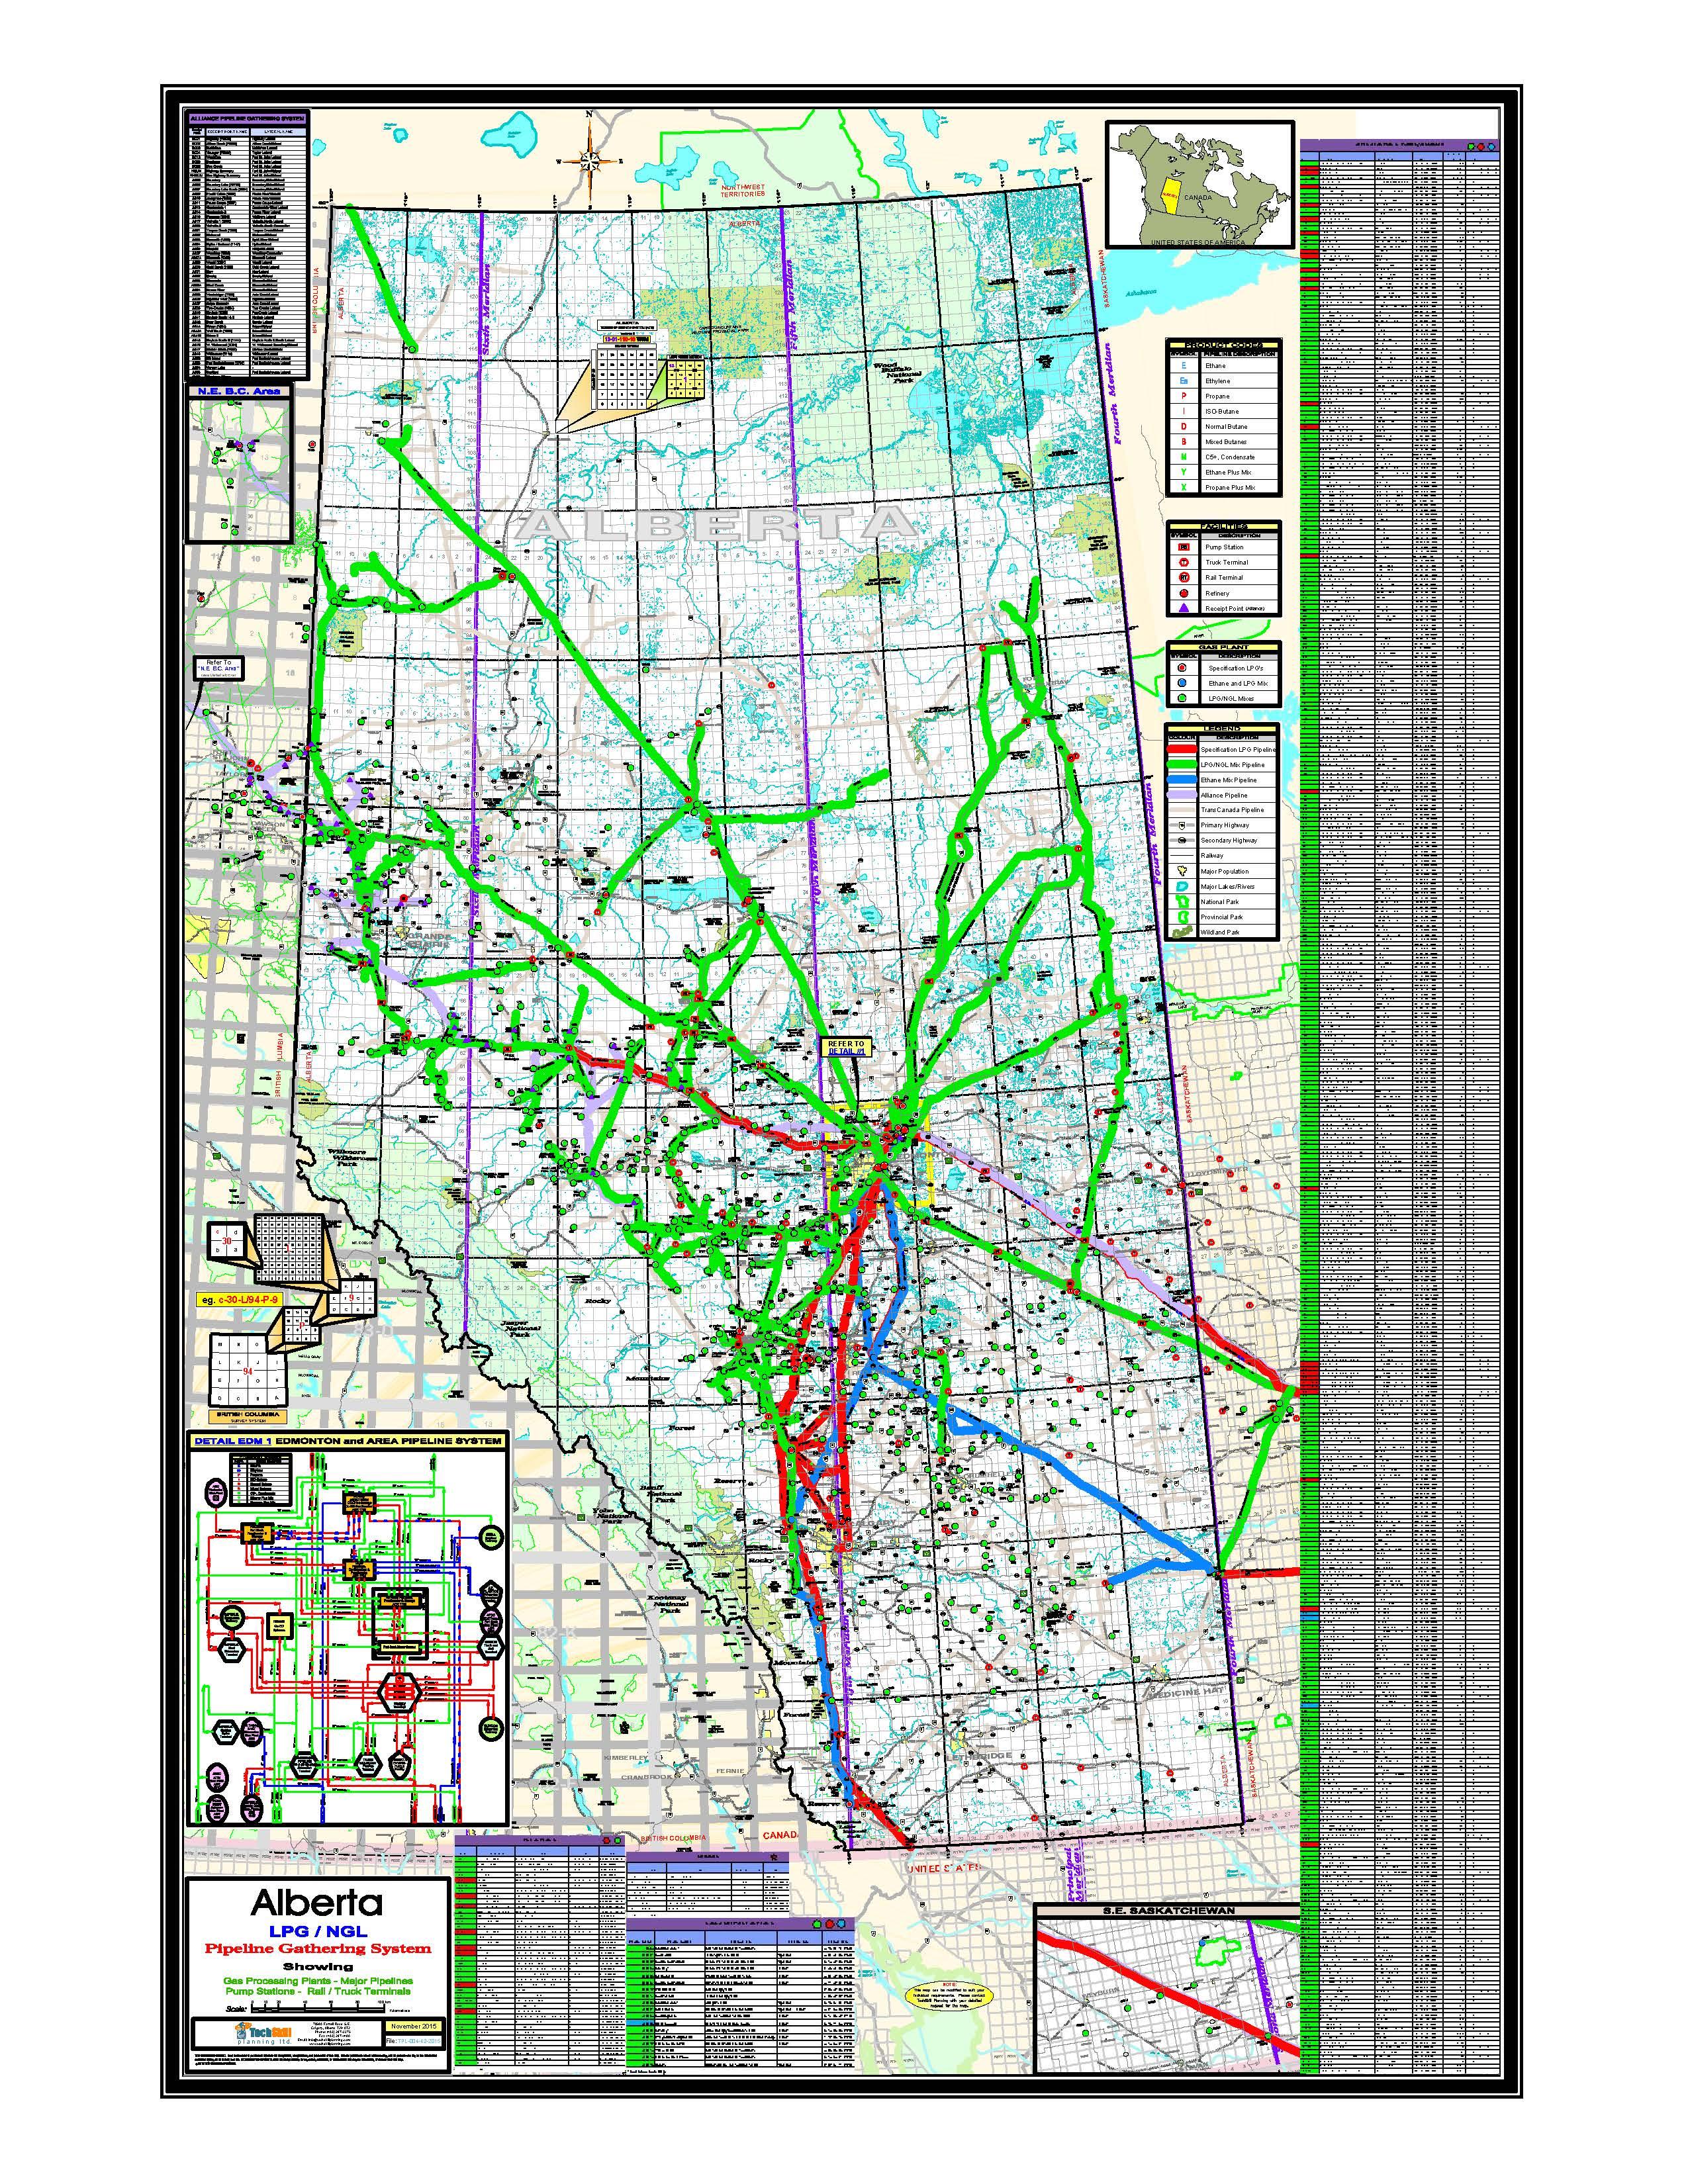 TechSkill Retail Mapping Pipeline Gathering System Alberta LPG